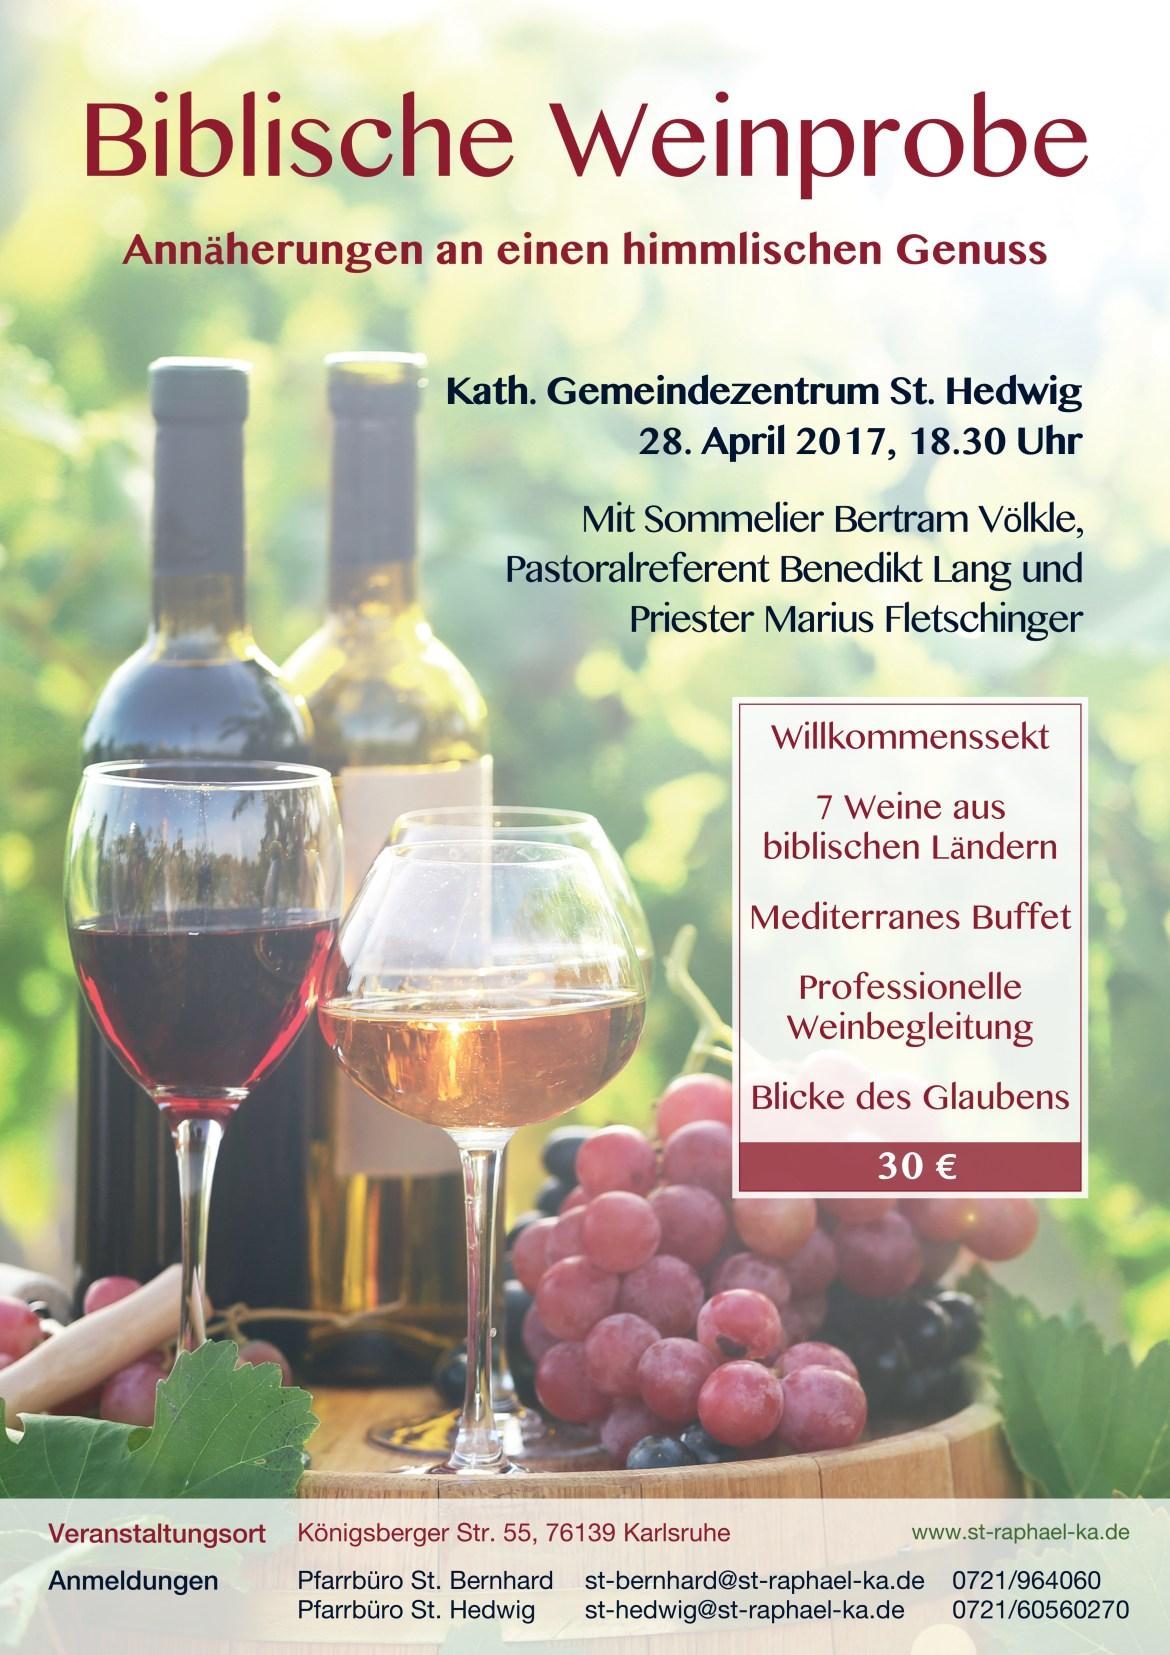 Bibl. Weinprobe 2017-04-28 St. Hedwig, Karlsruhe